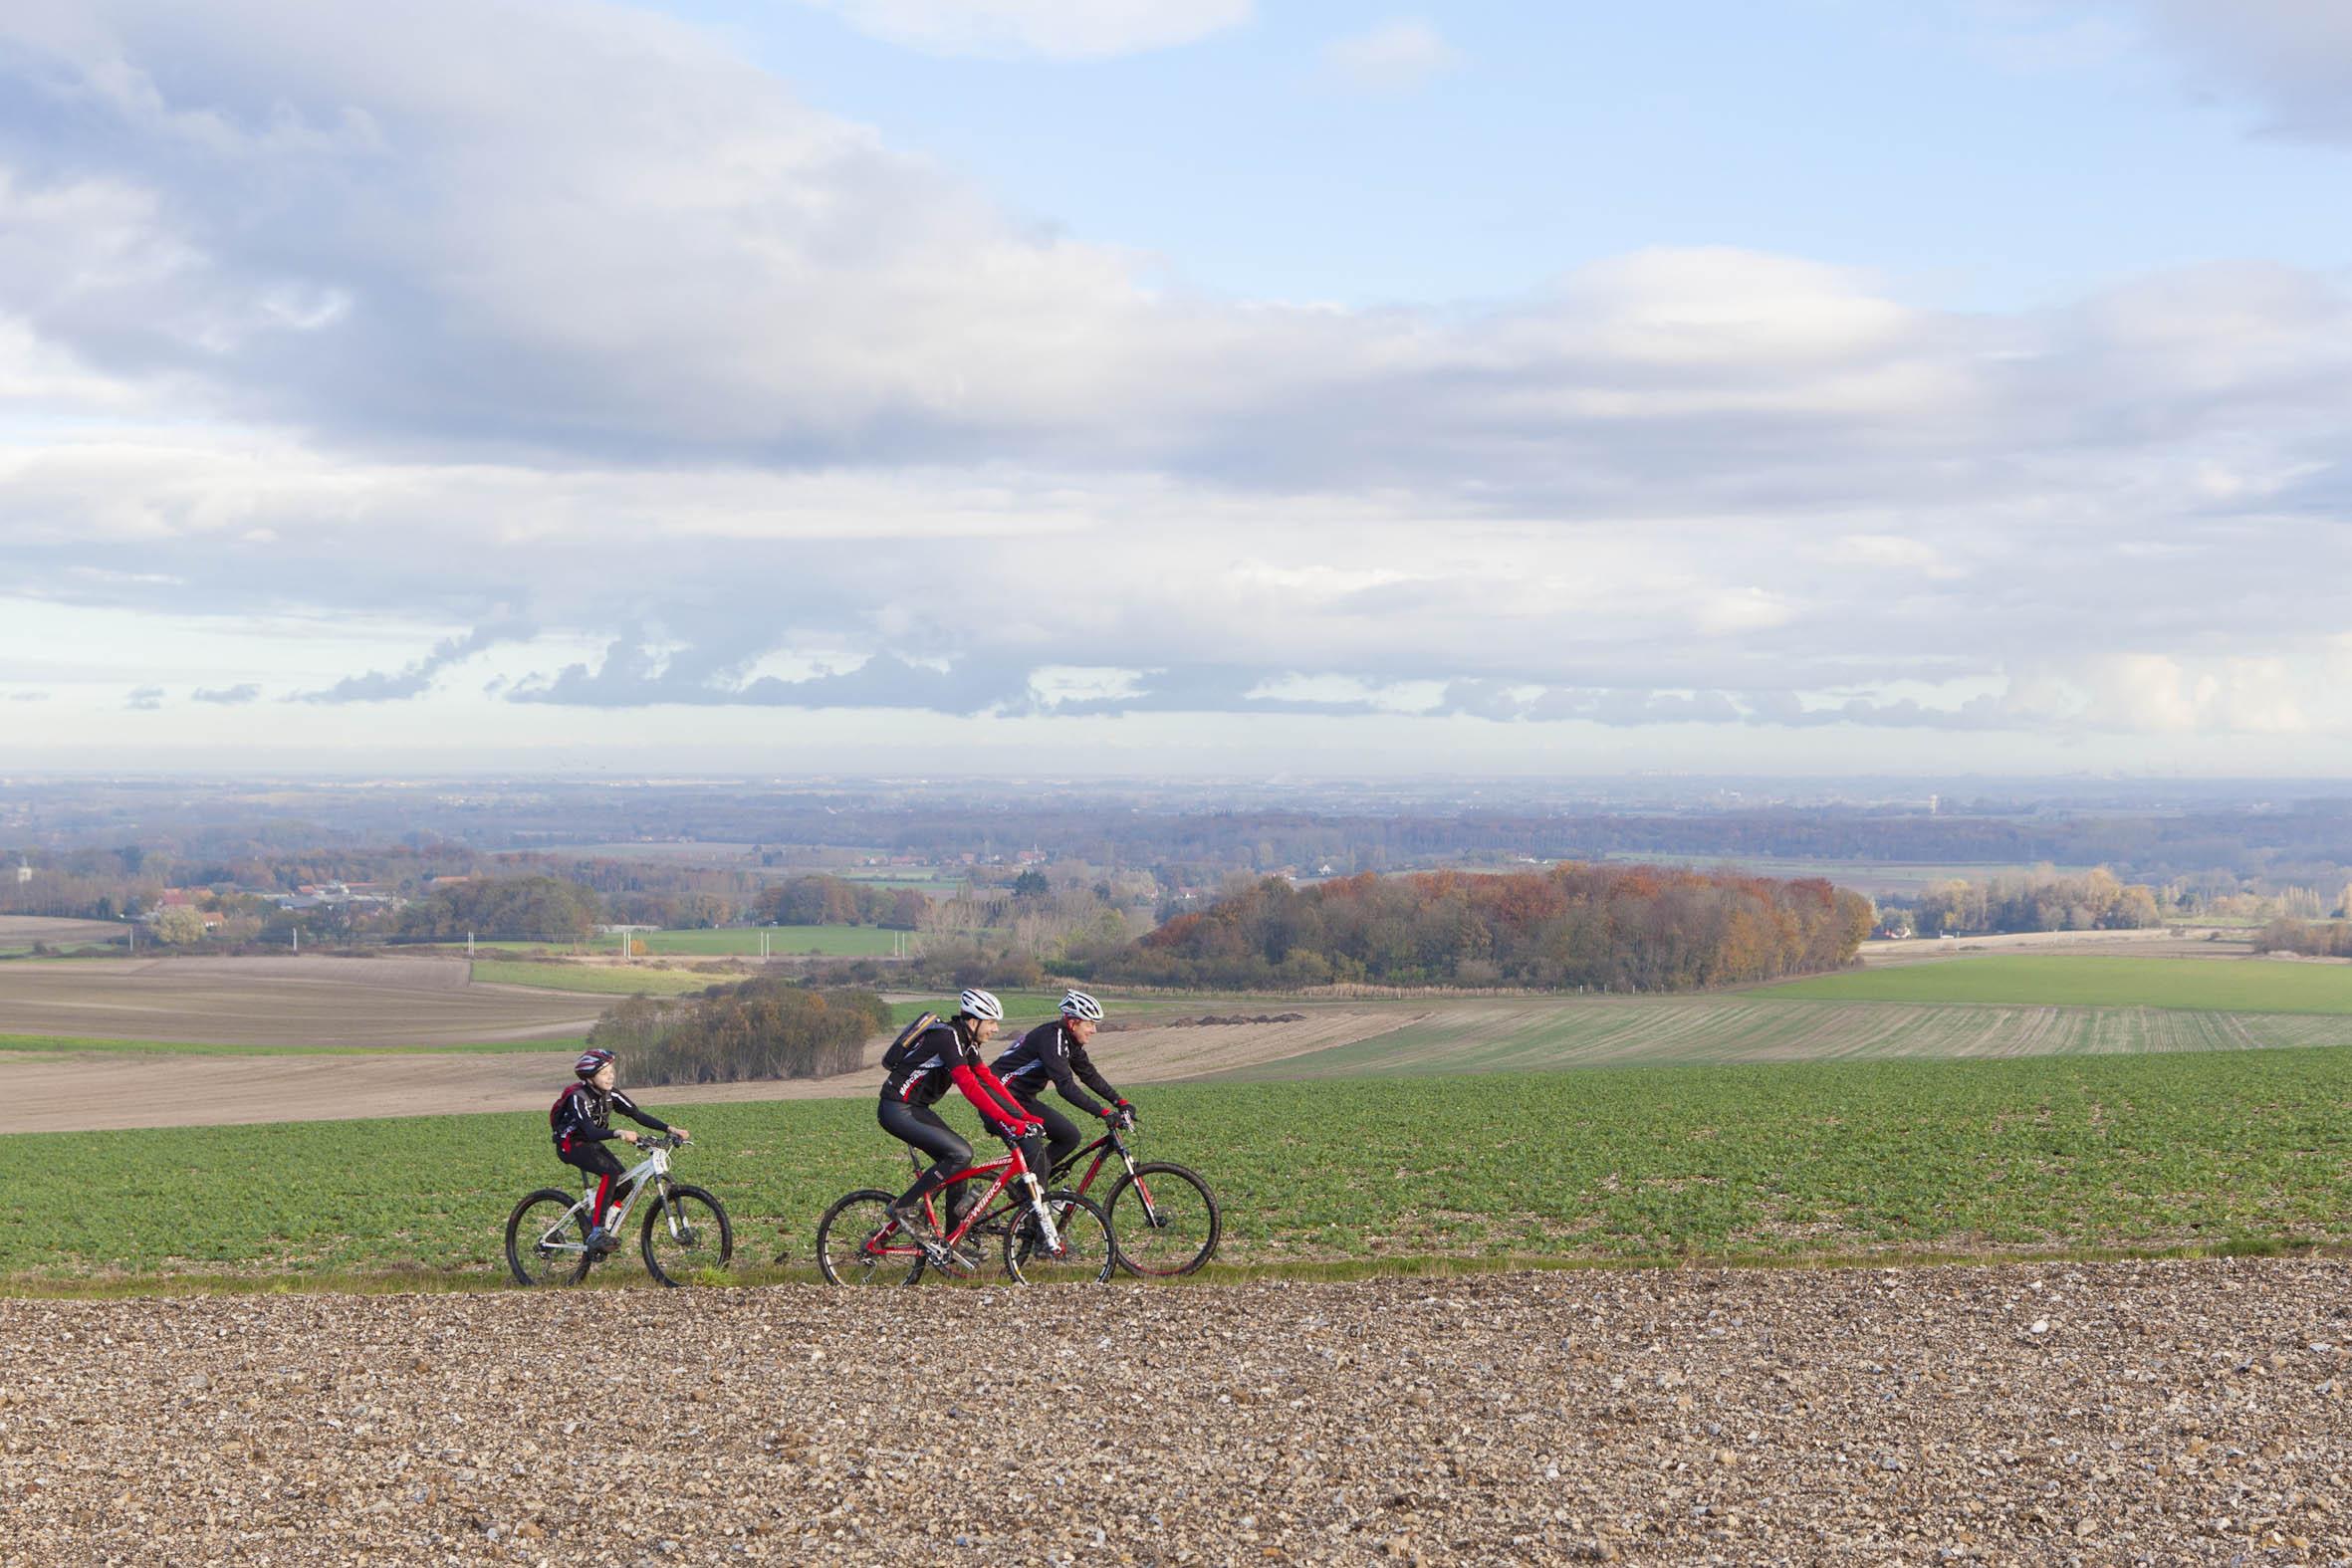 Sortie forêt de Tournehem. 11 Novembre 2012.